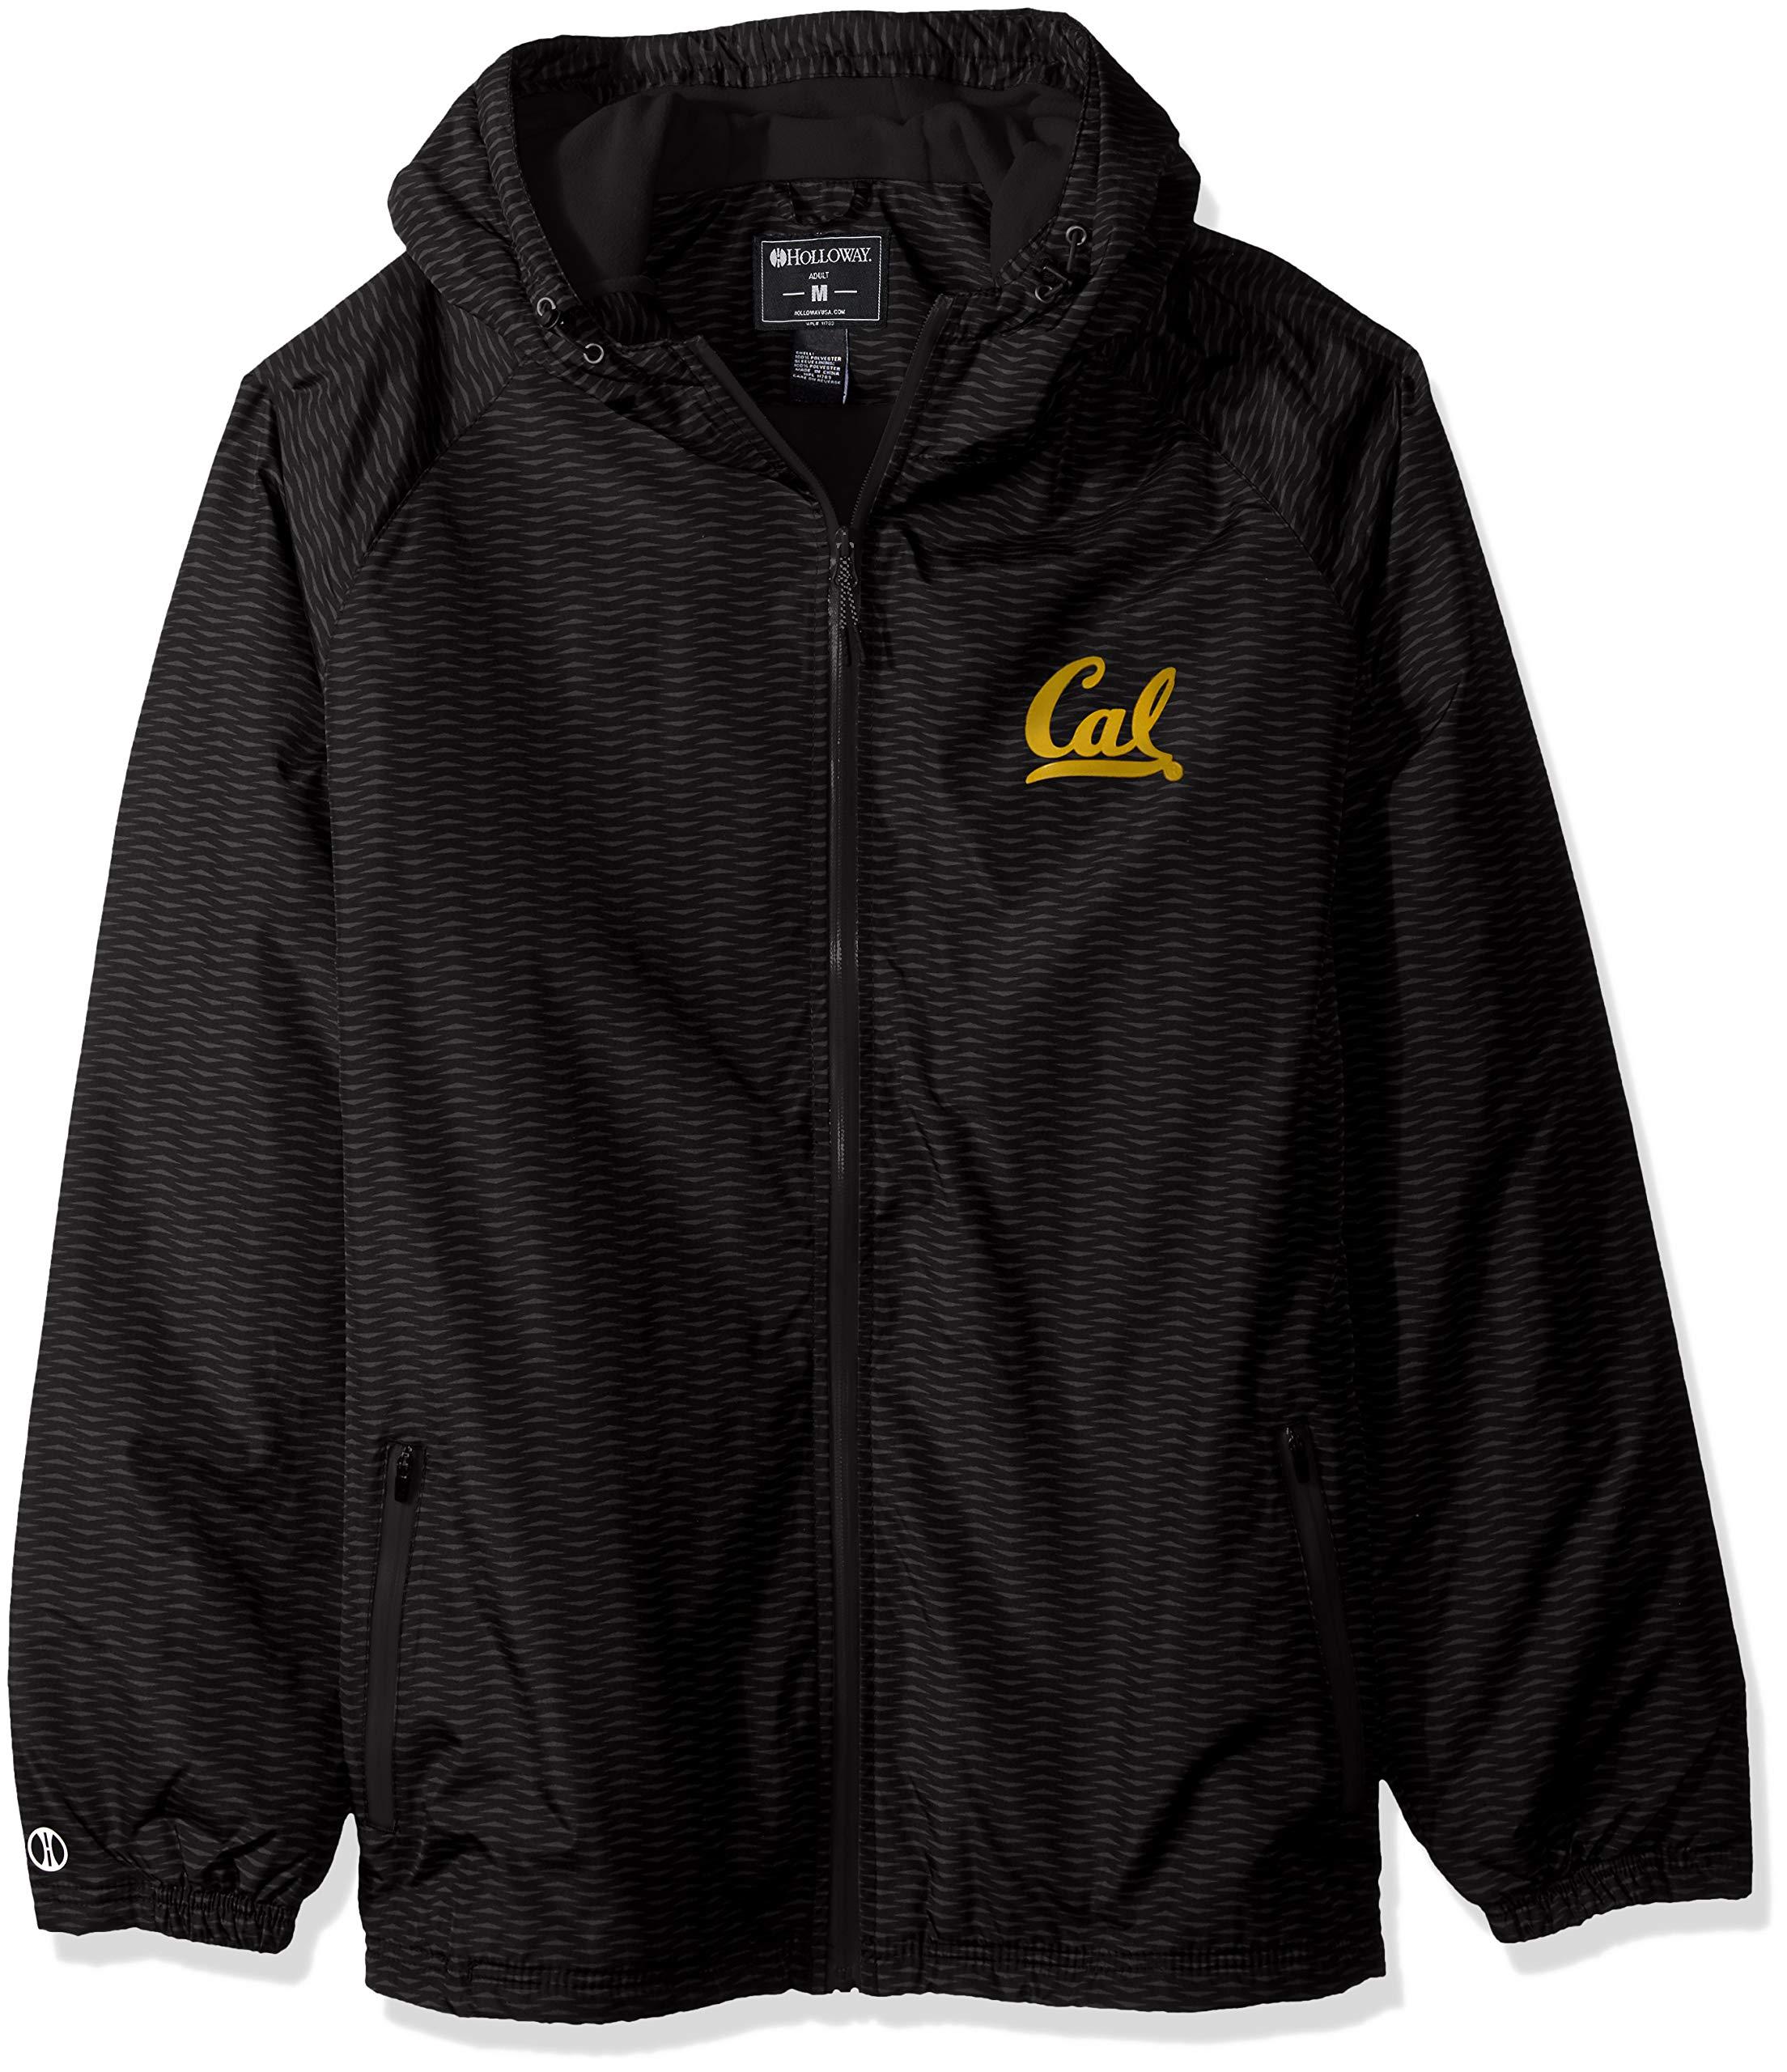 Ouray Sportswear NCAA California Golden Bears Range Jacket, Carbon, 2X